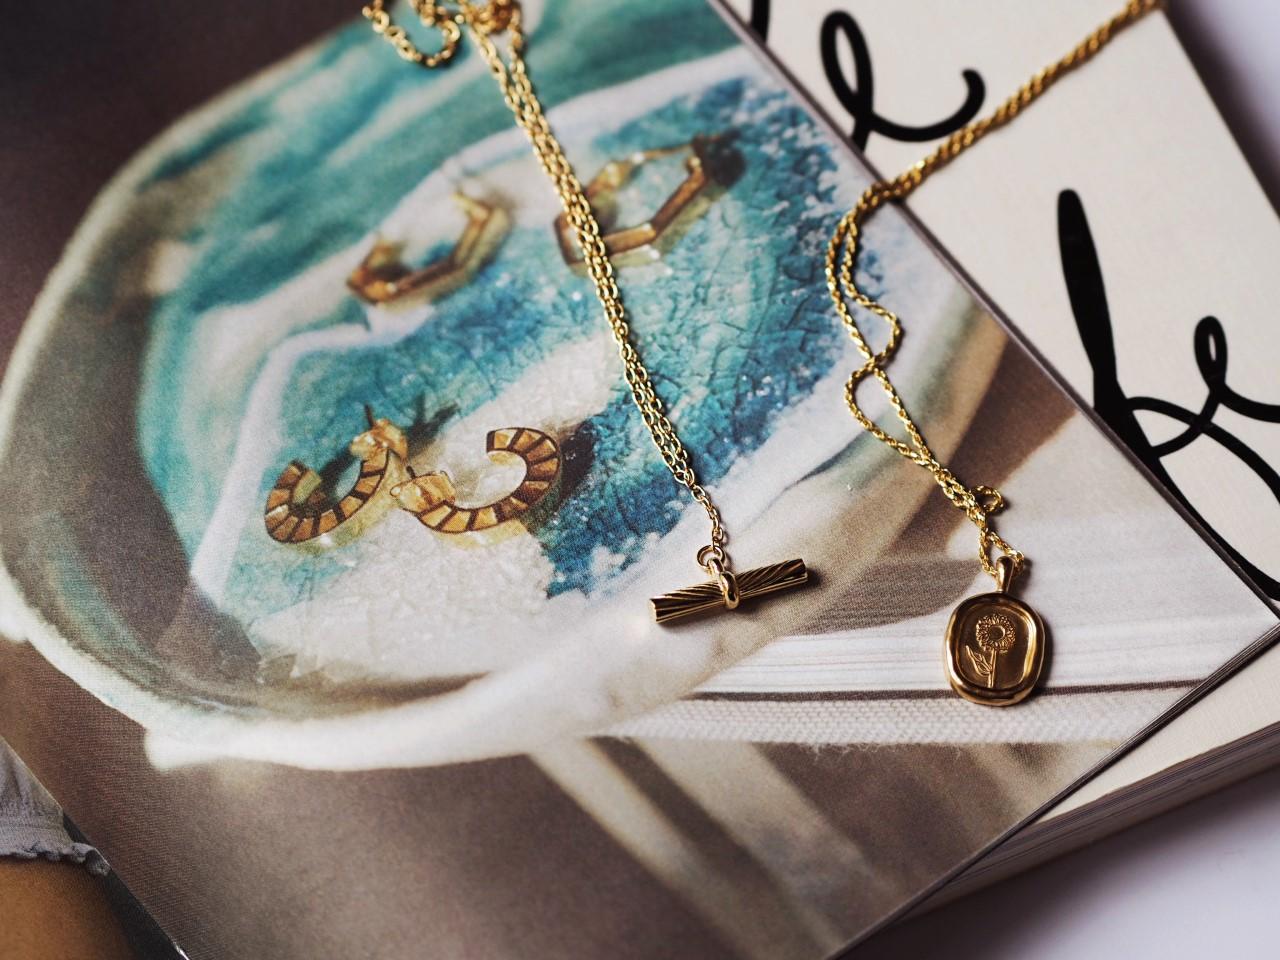 Daisy London Jewellery flower necklace pendant